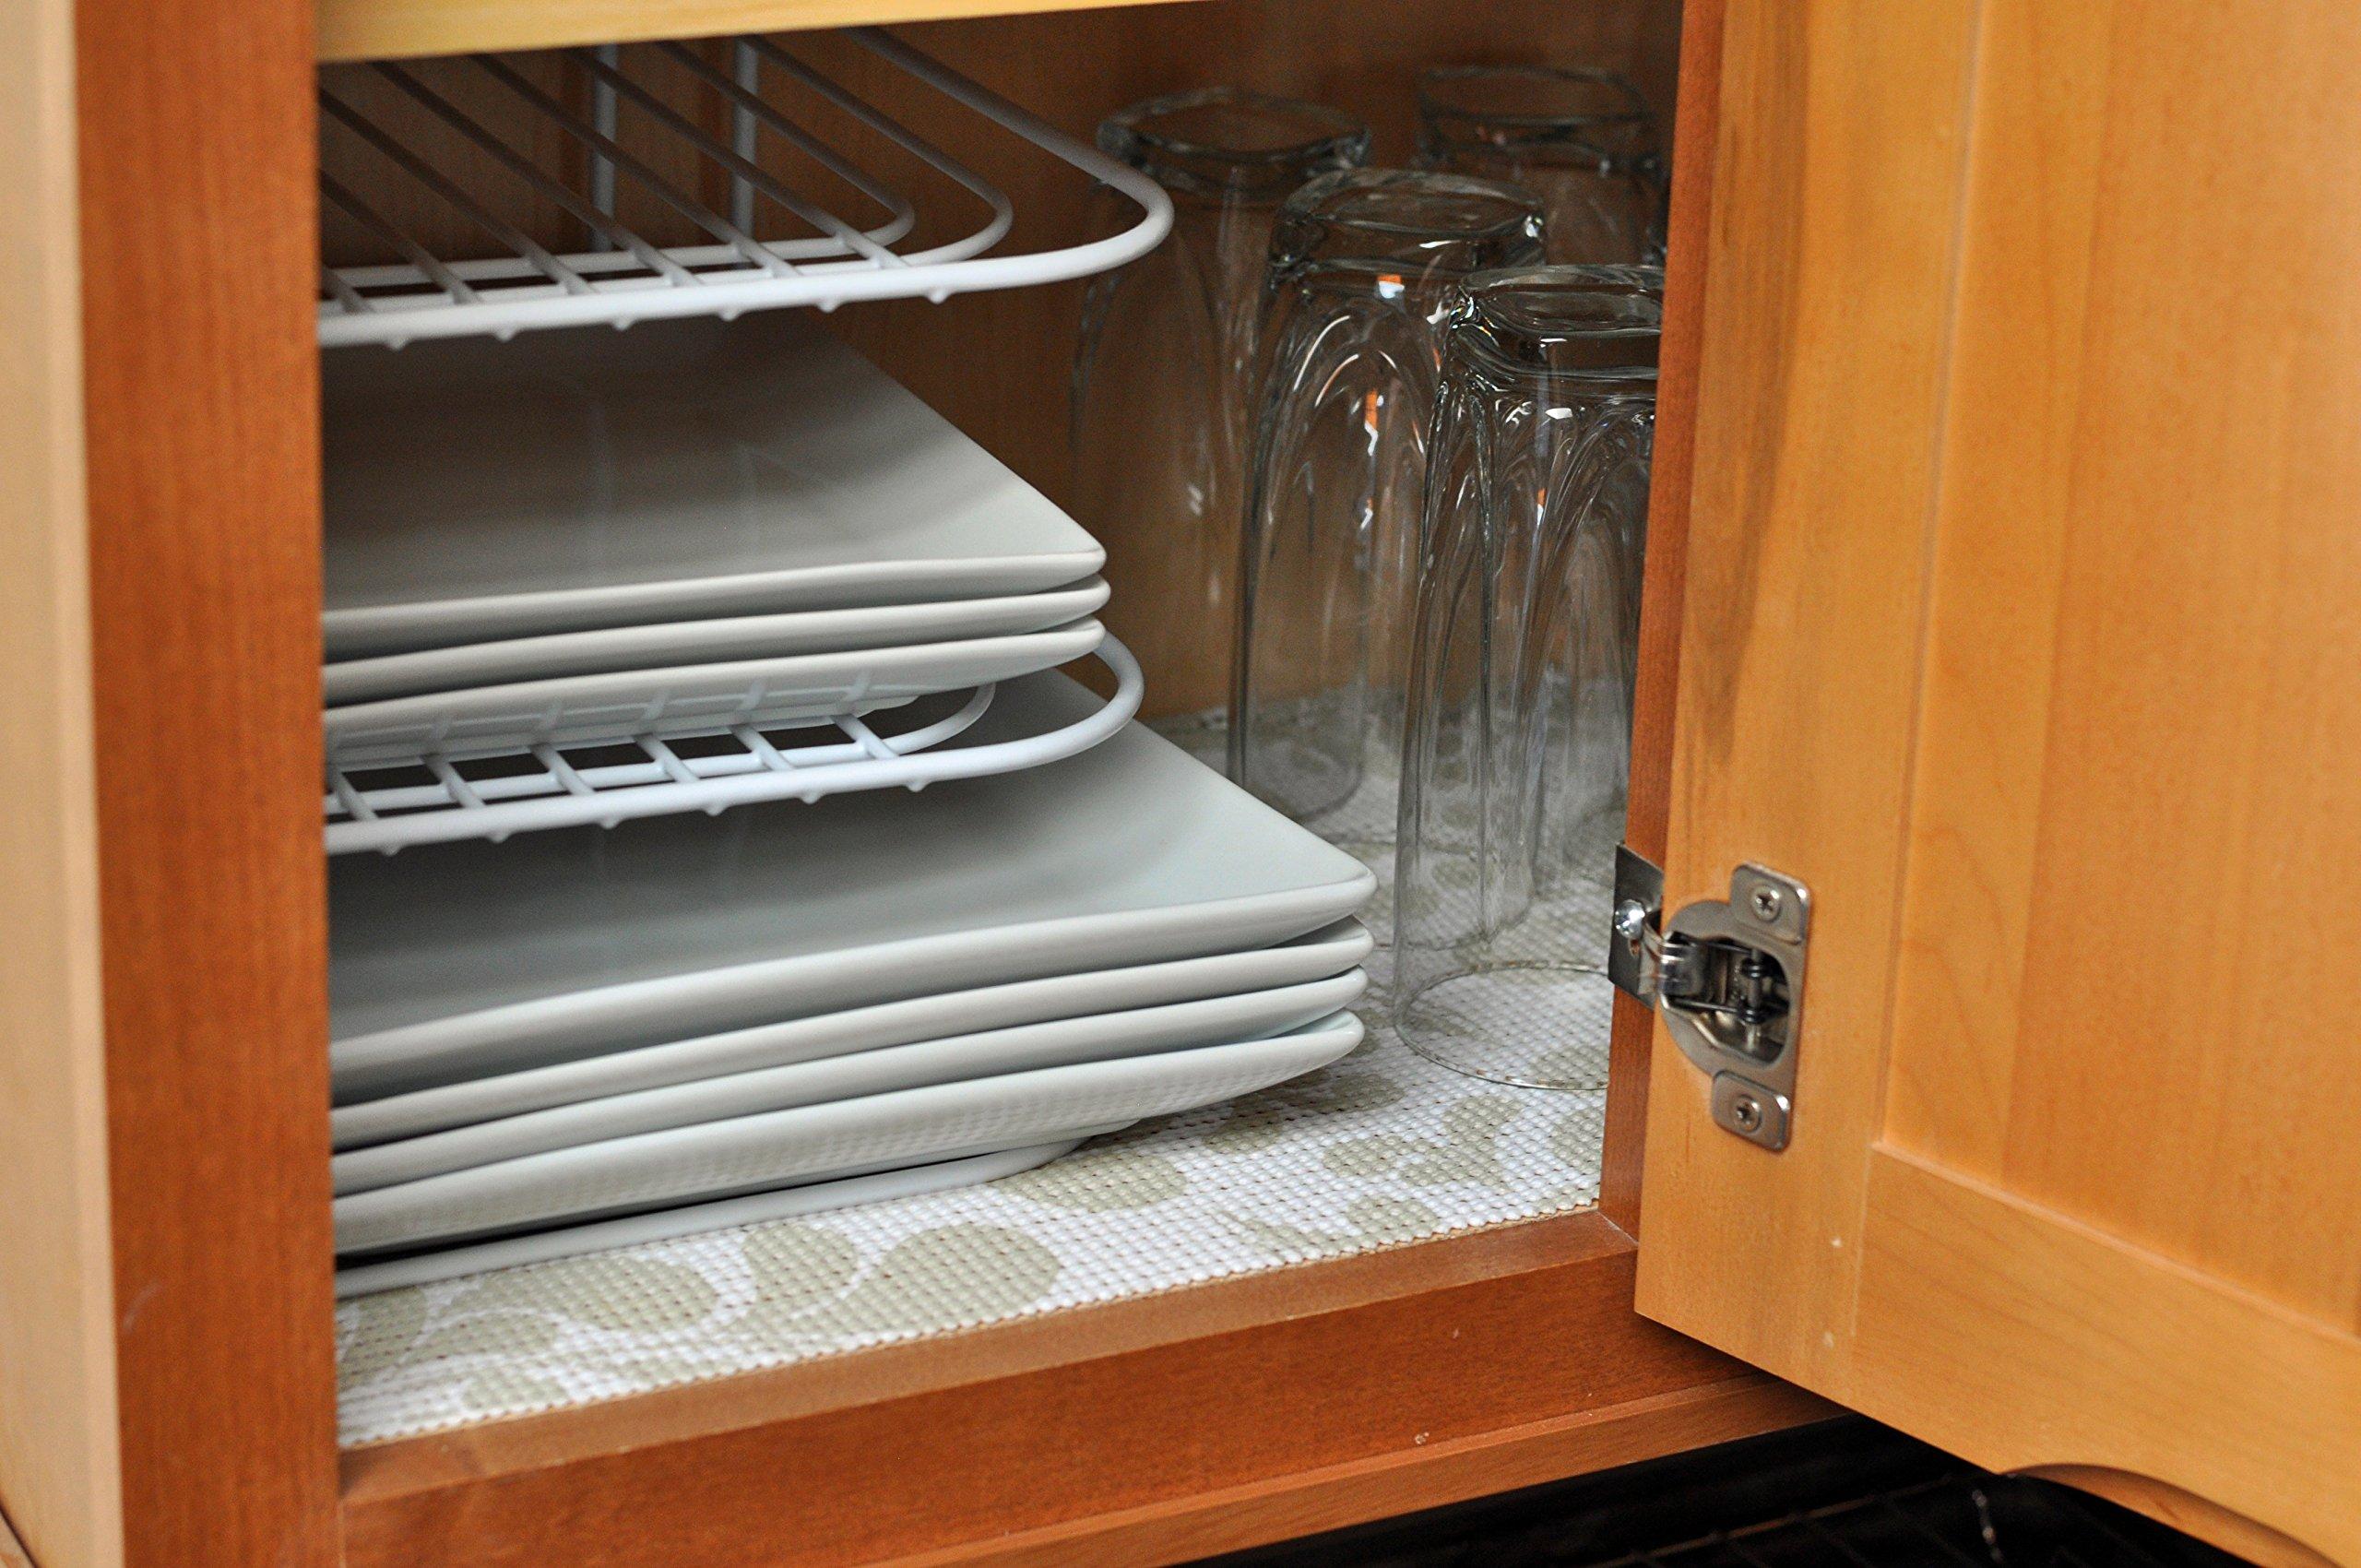 3 Pcs- Kitchen Cabinet Organizer Set| 3 Tier Corner Plate Rack| Under Shelf Basket| Magic Cover Vinyl Liner